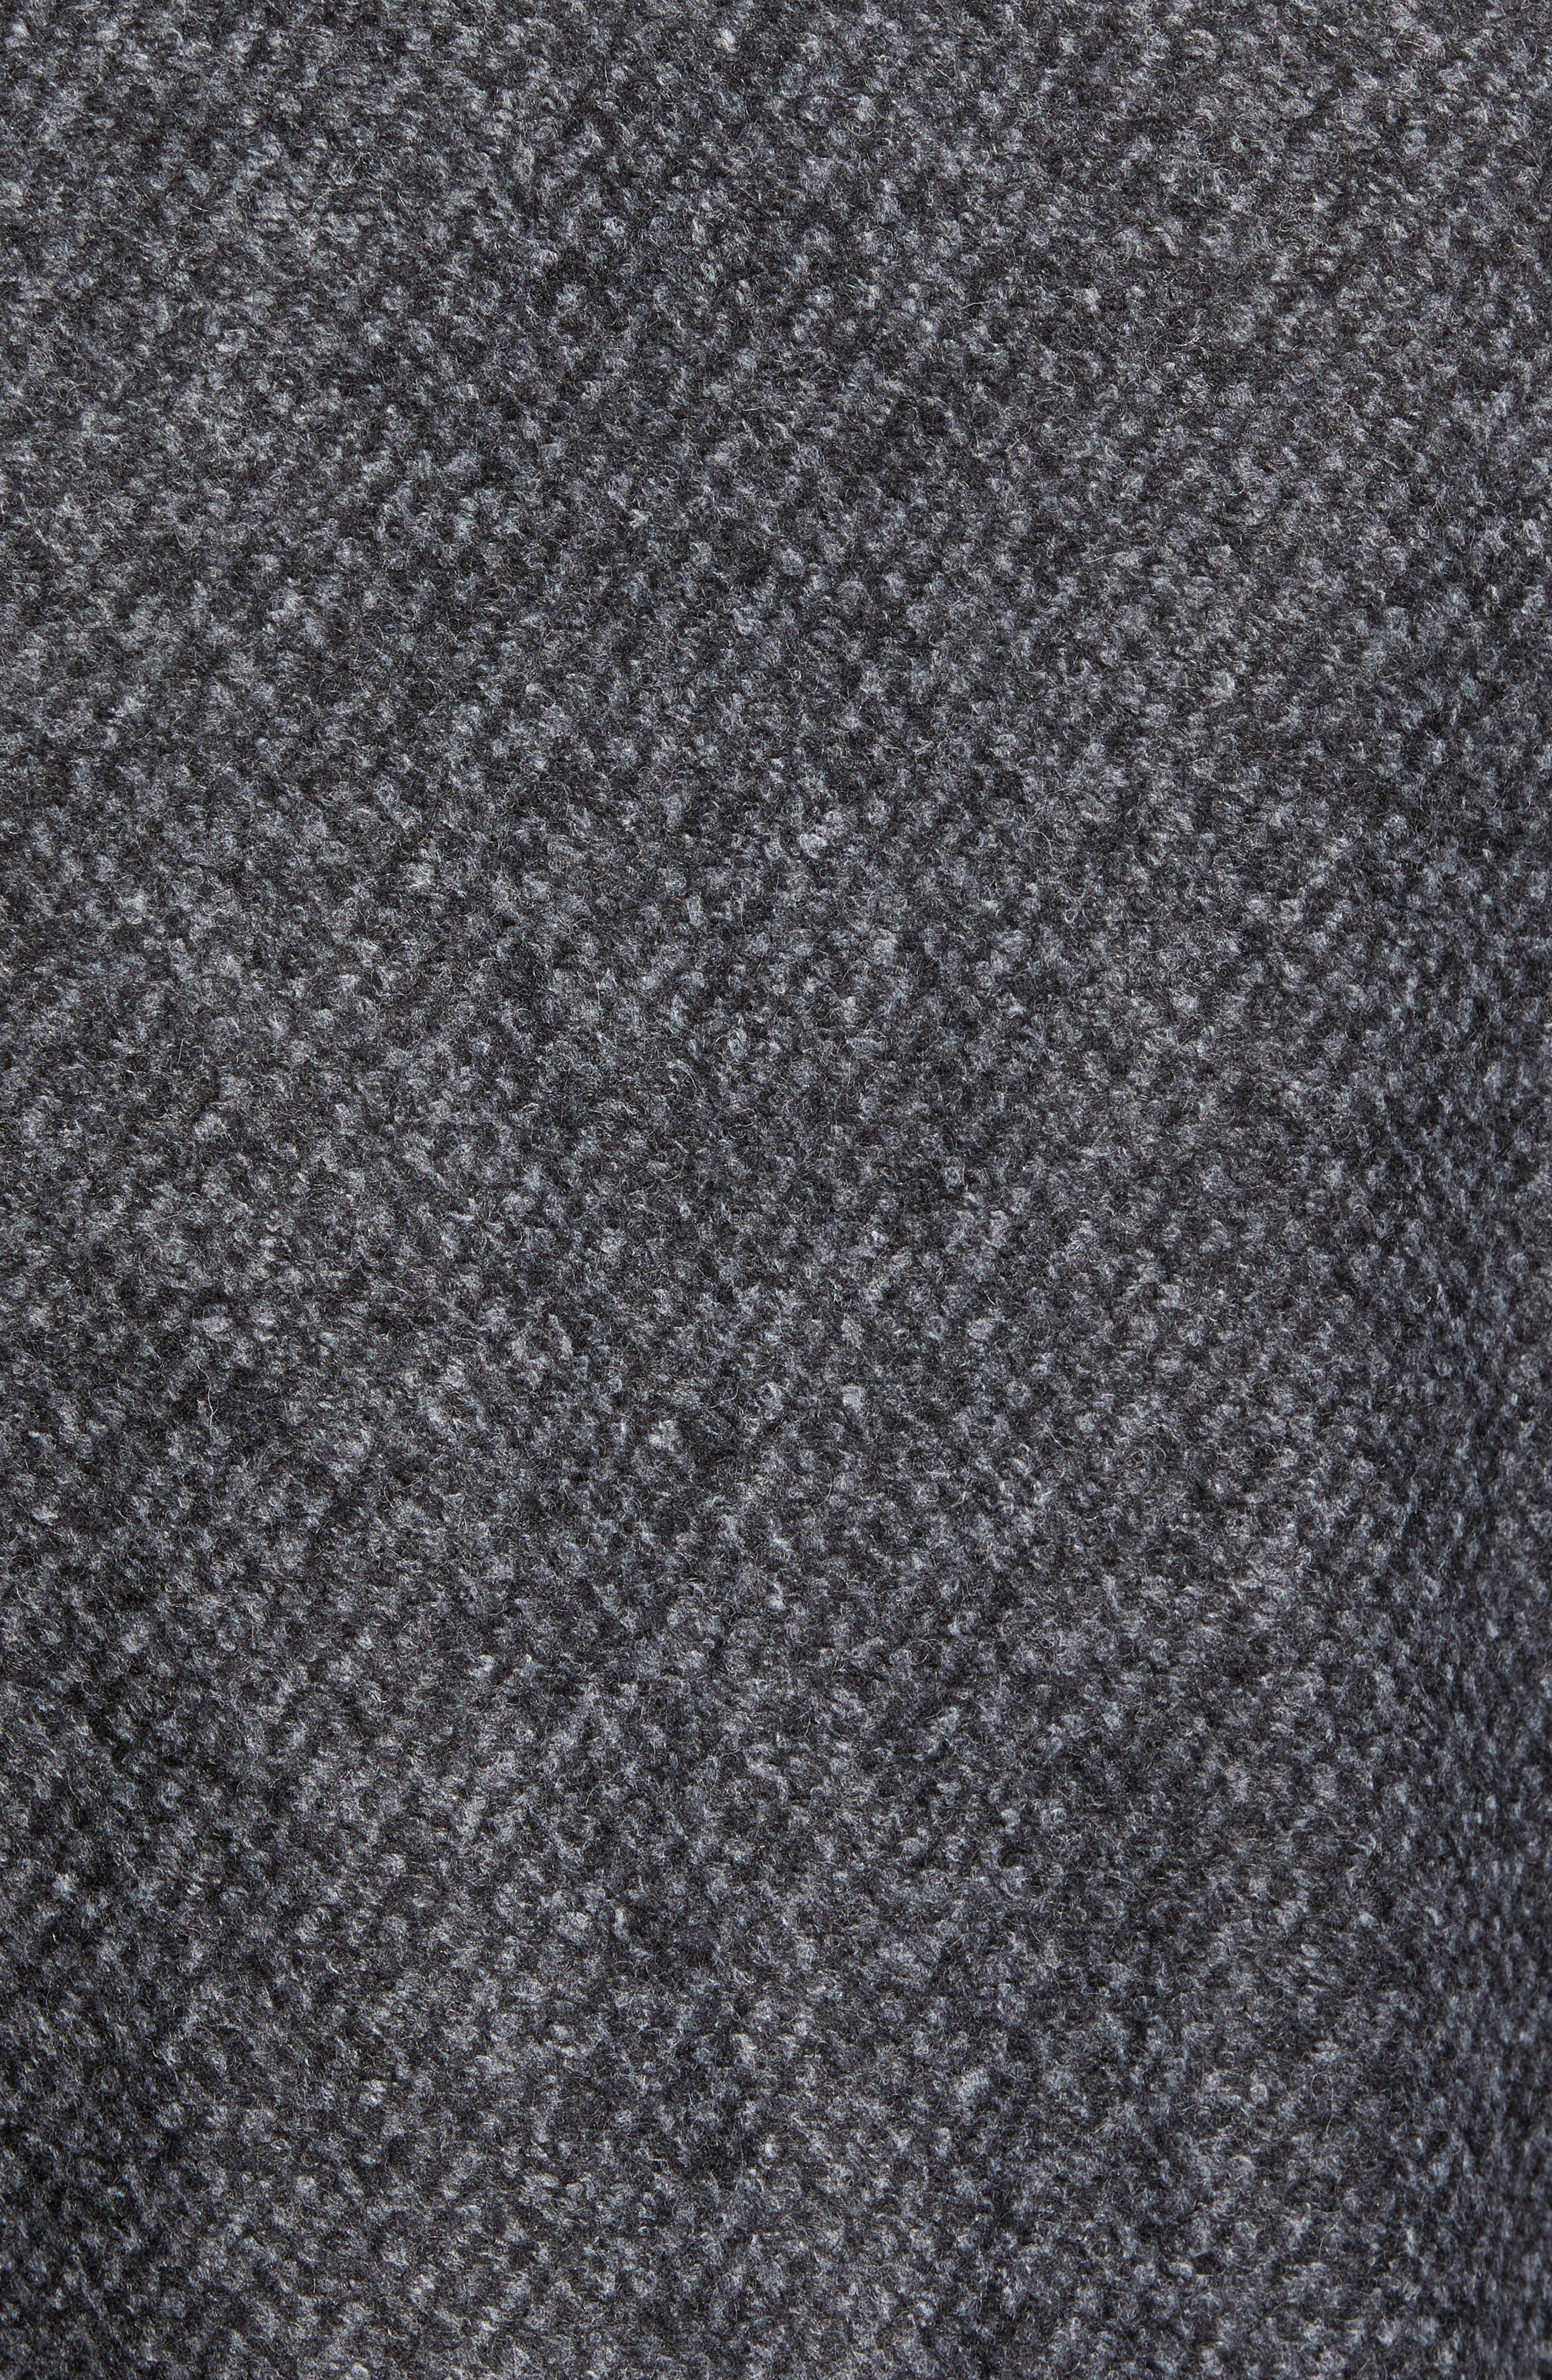 Salea Slim Fit Bomber Jacket,                             Alternate thumbnail 5, color,                             030